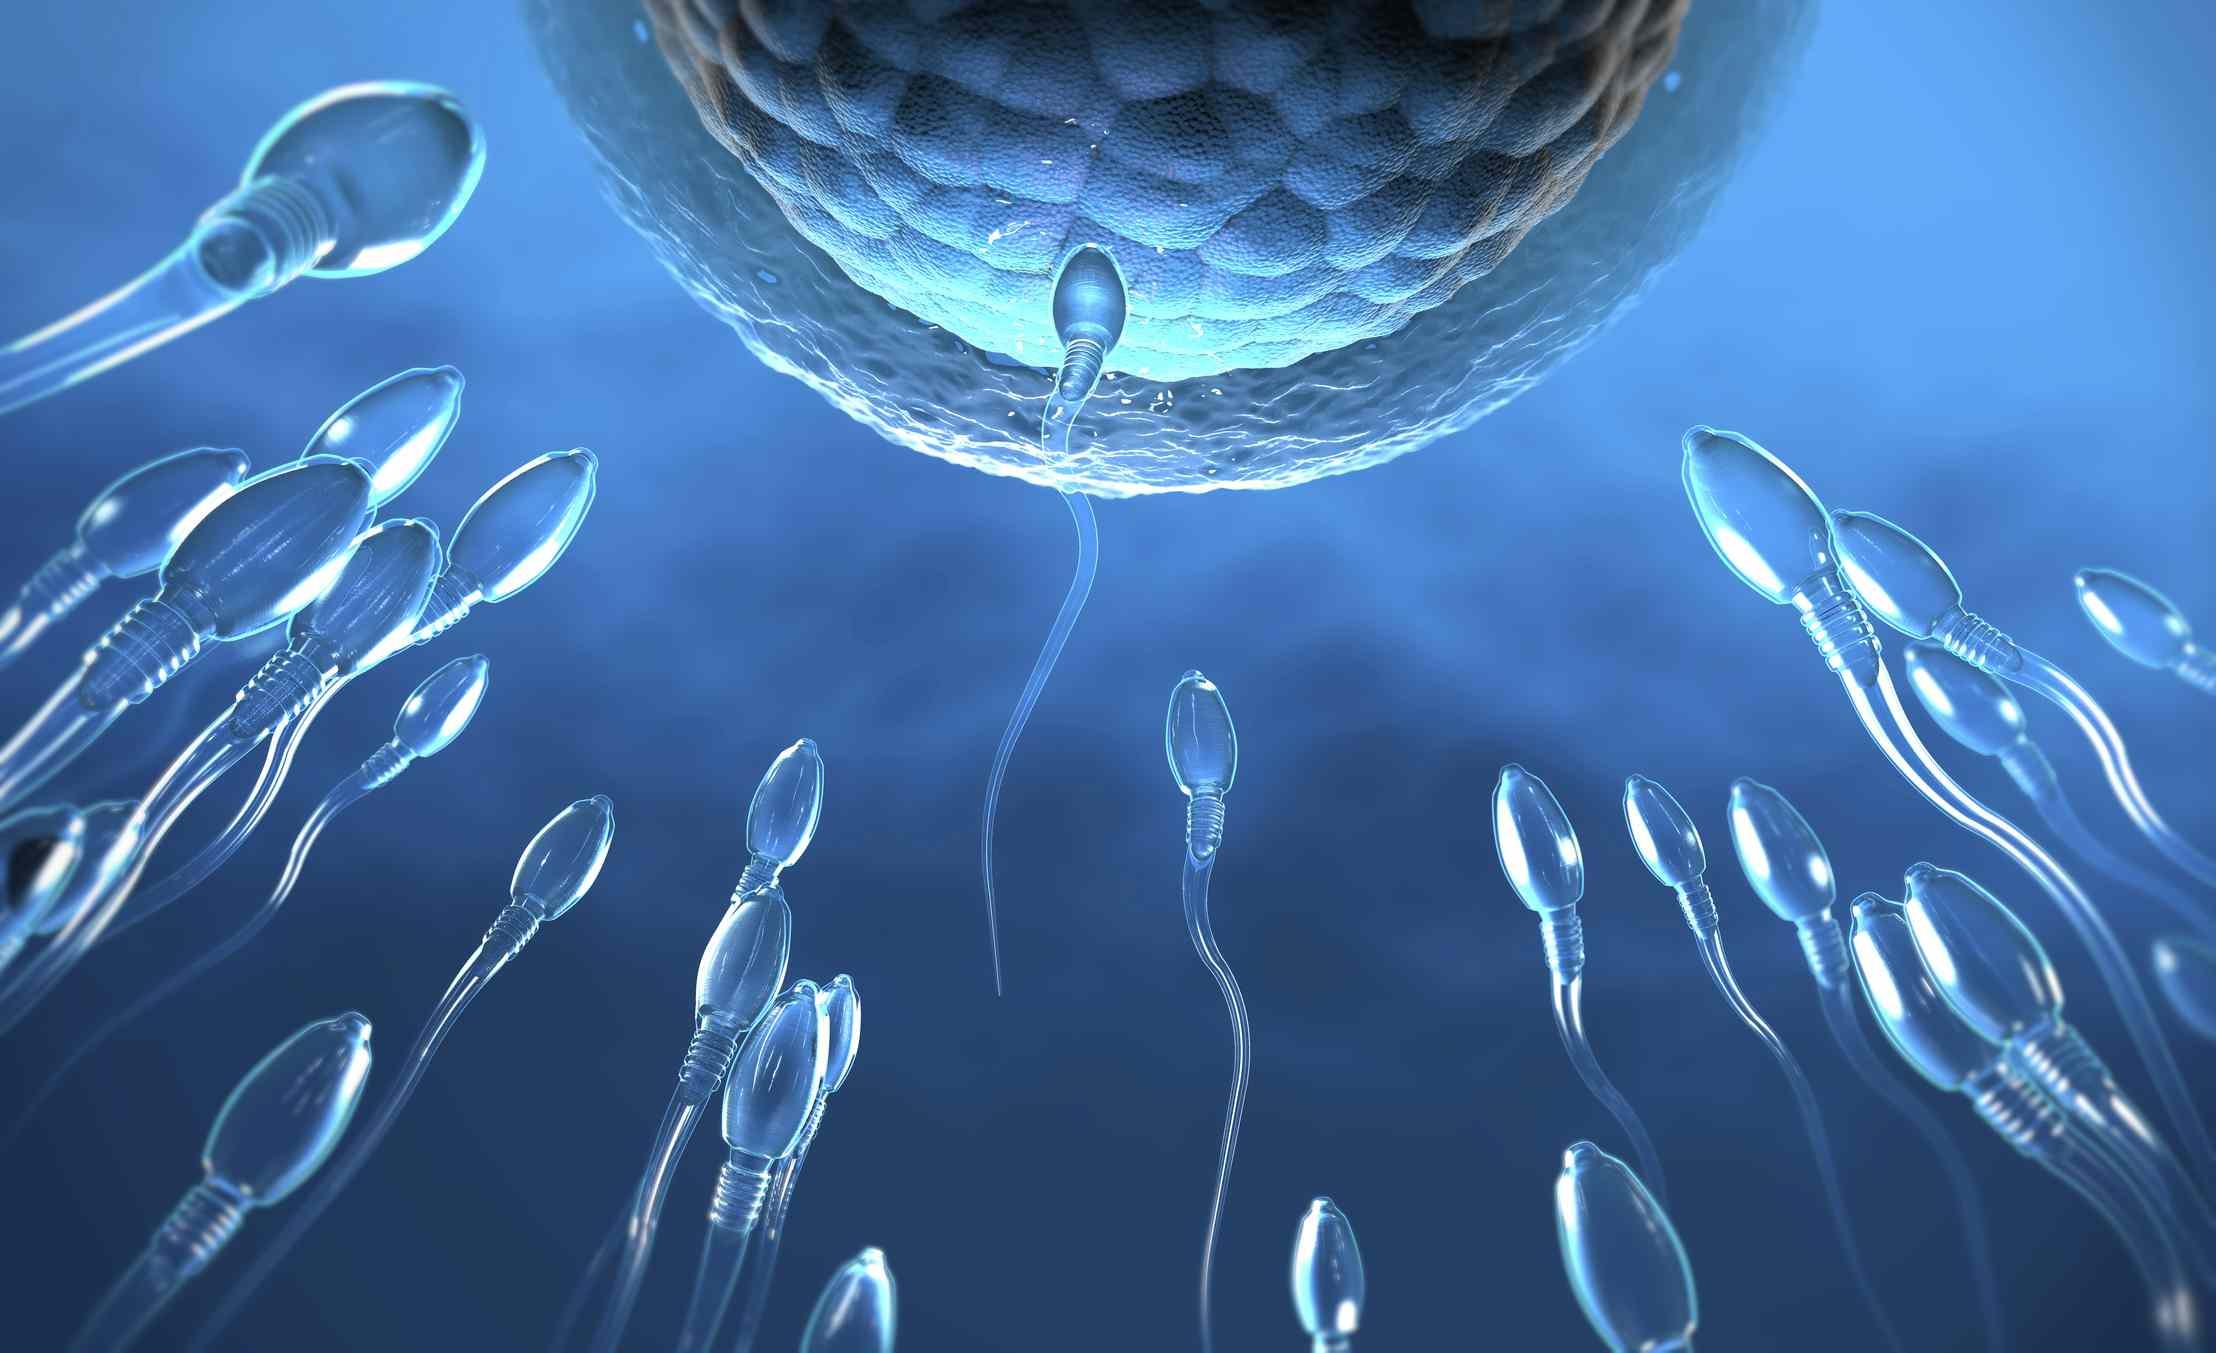 3d illustration of transparent sperm cells swimming toward egg cell